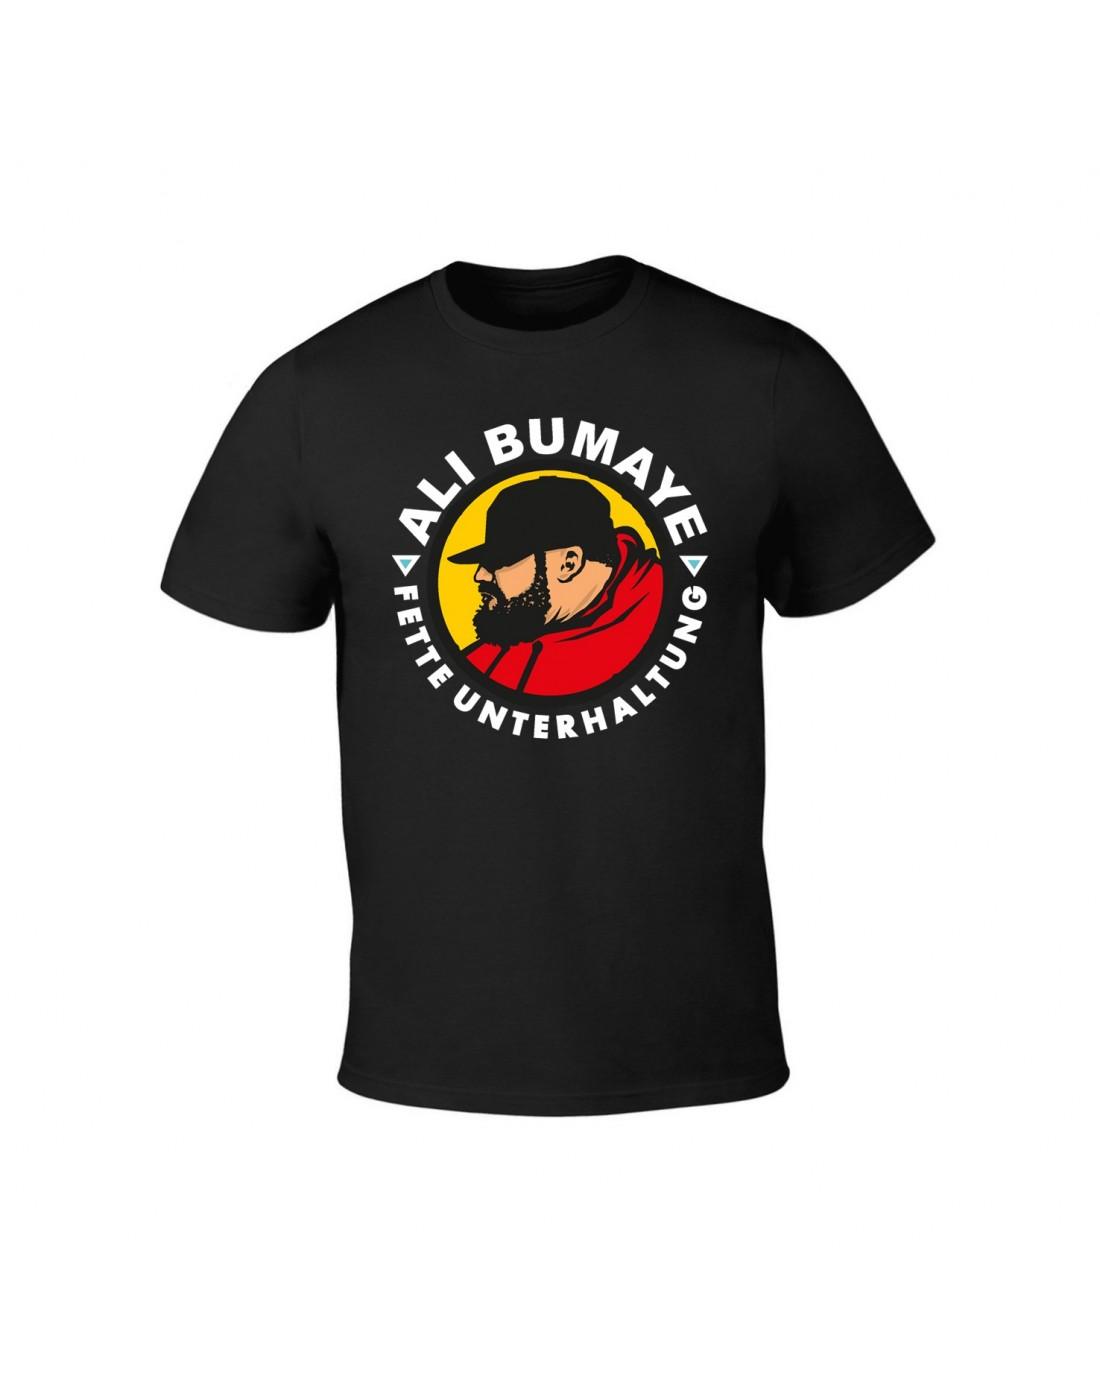 EASYdoesit T-Shirt - Anna T-iron